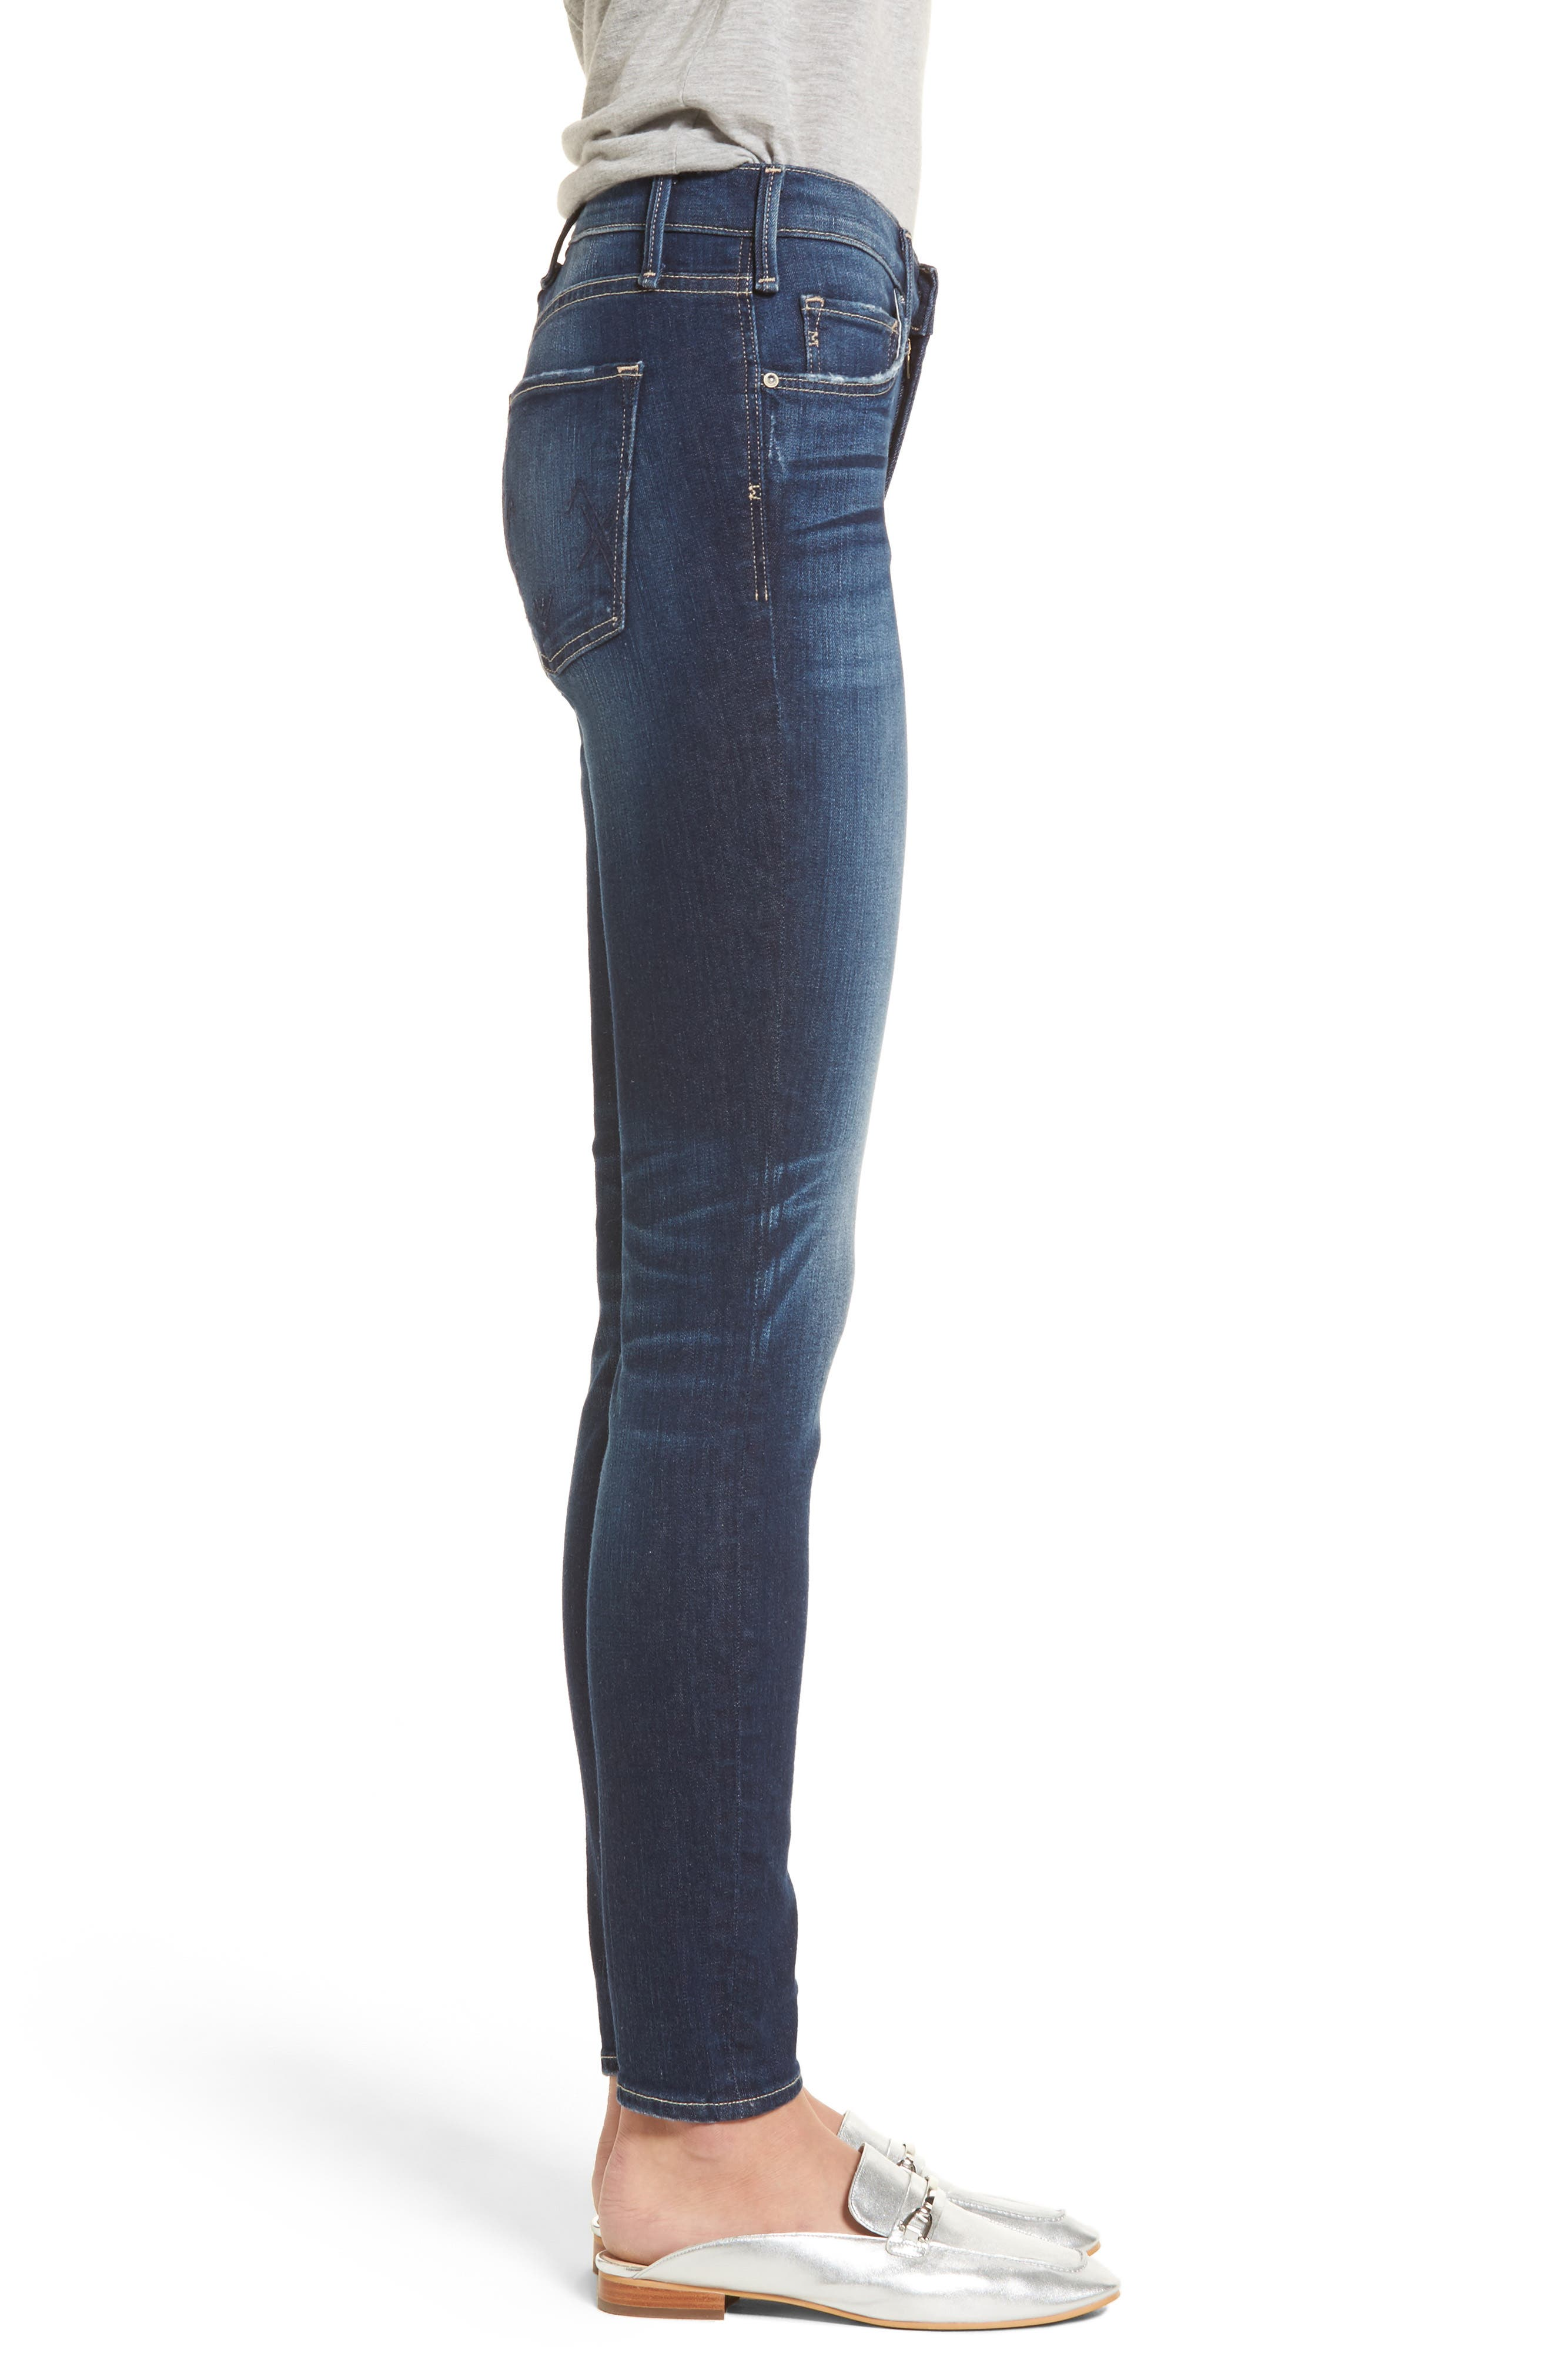 Newton Skinny Jeans,                             Alternate thumbnail 3, color,                             429